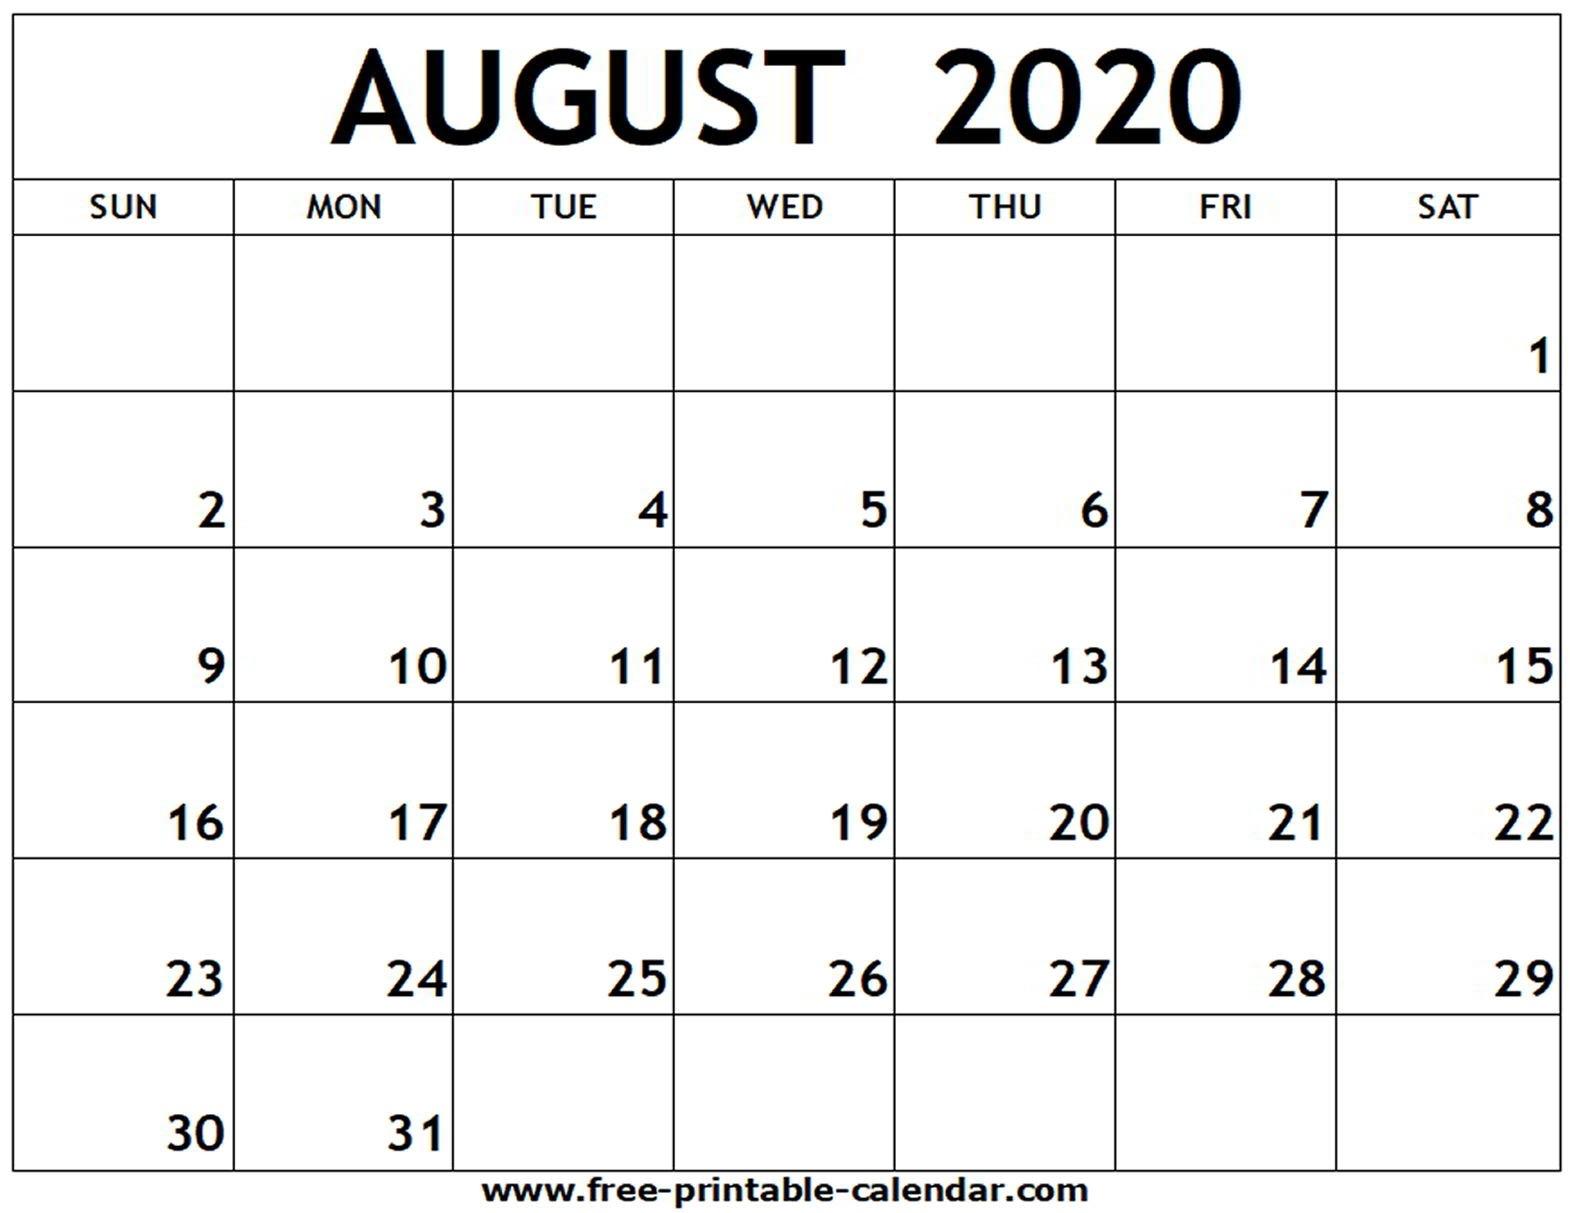 August 2020 Printable Calendar - Free-Printable-Calendar-Blank Calendar Template June July August 2020